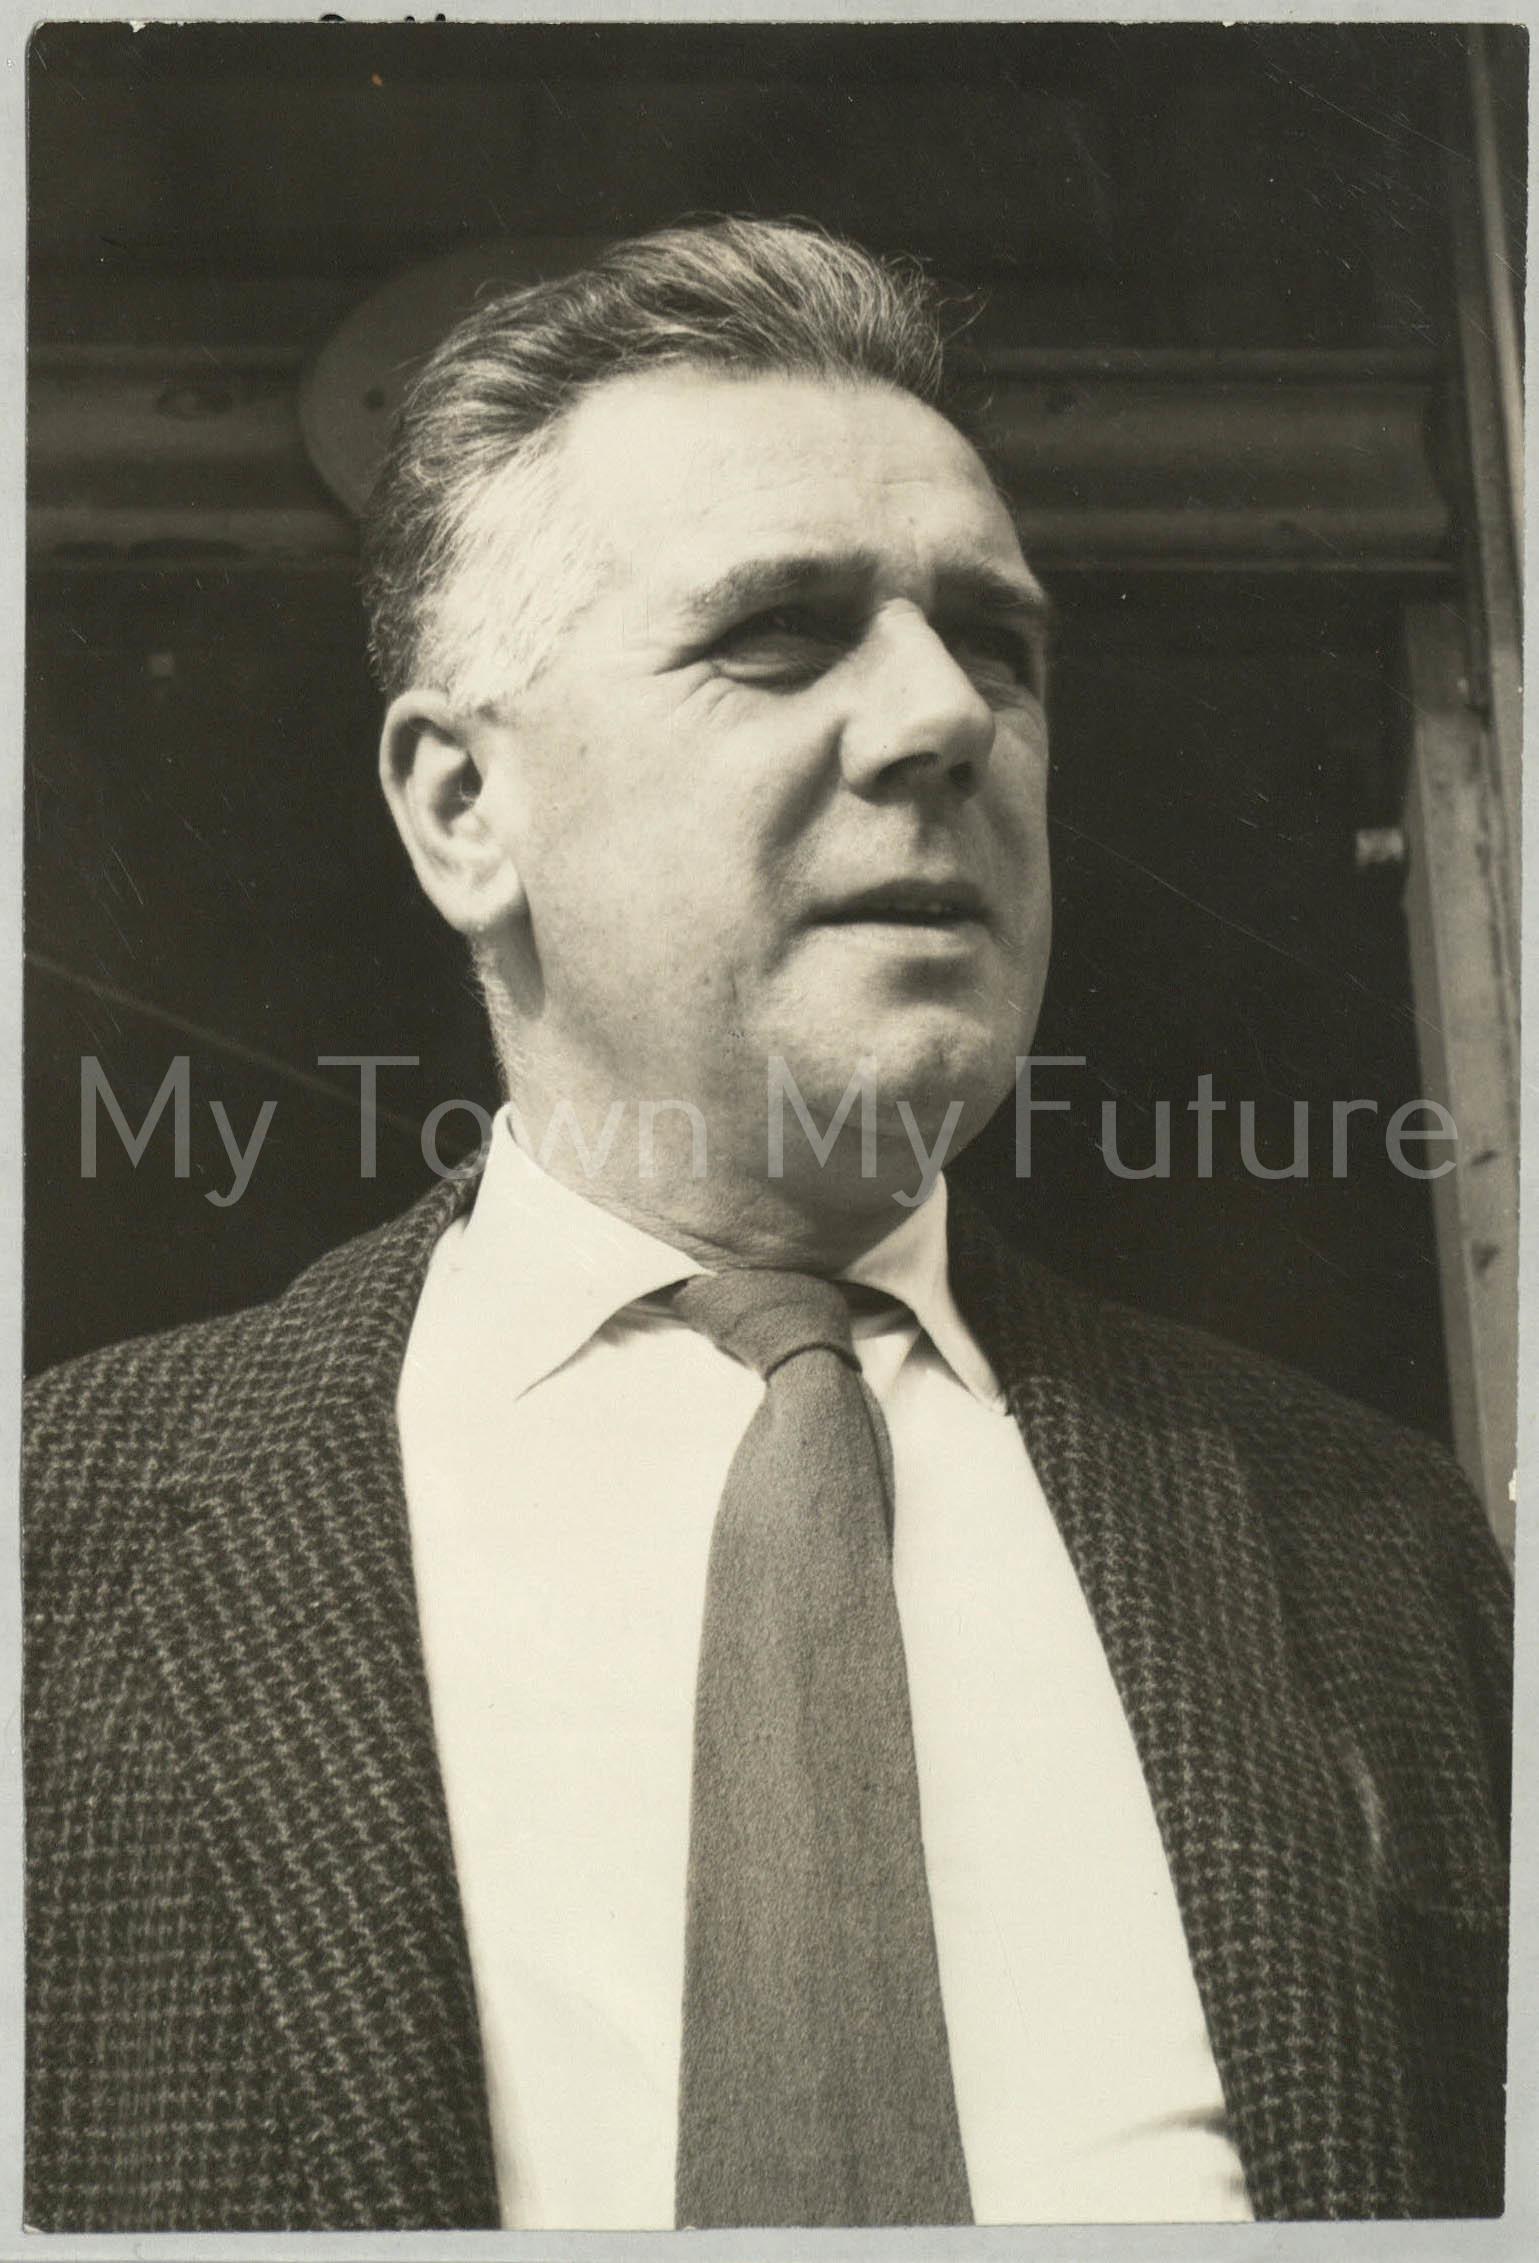 Mr J.W.Fletcher